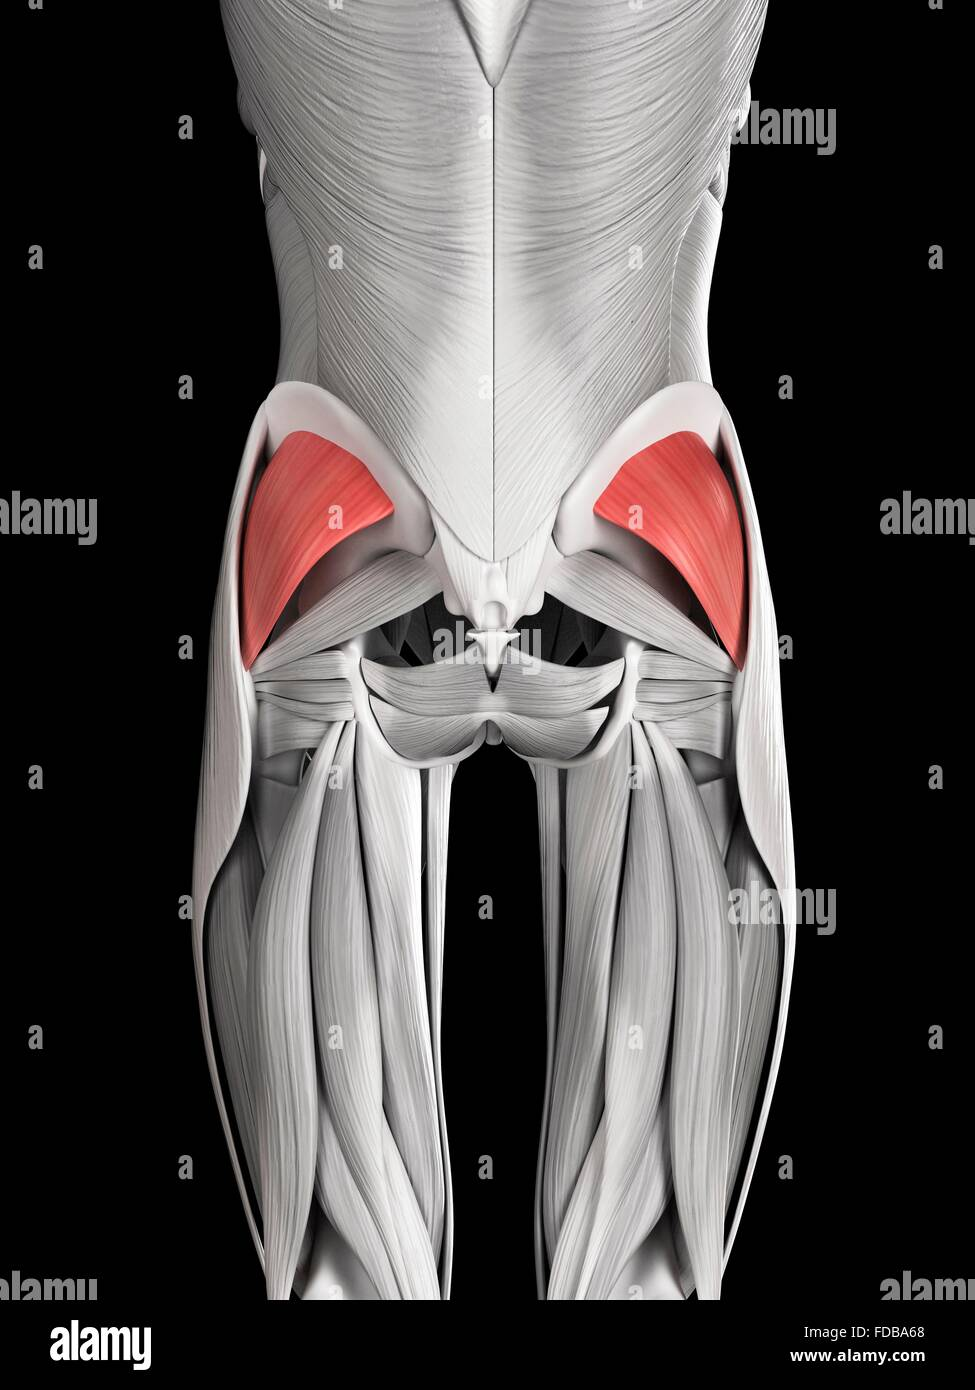 Anatomy Of Human Buttocks Stock Photos & Anatomy Of Human Buttocks ...